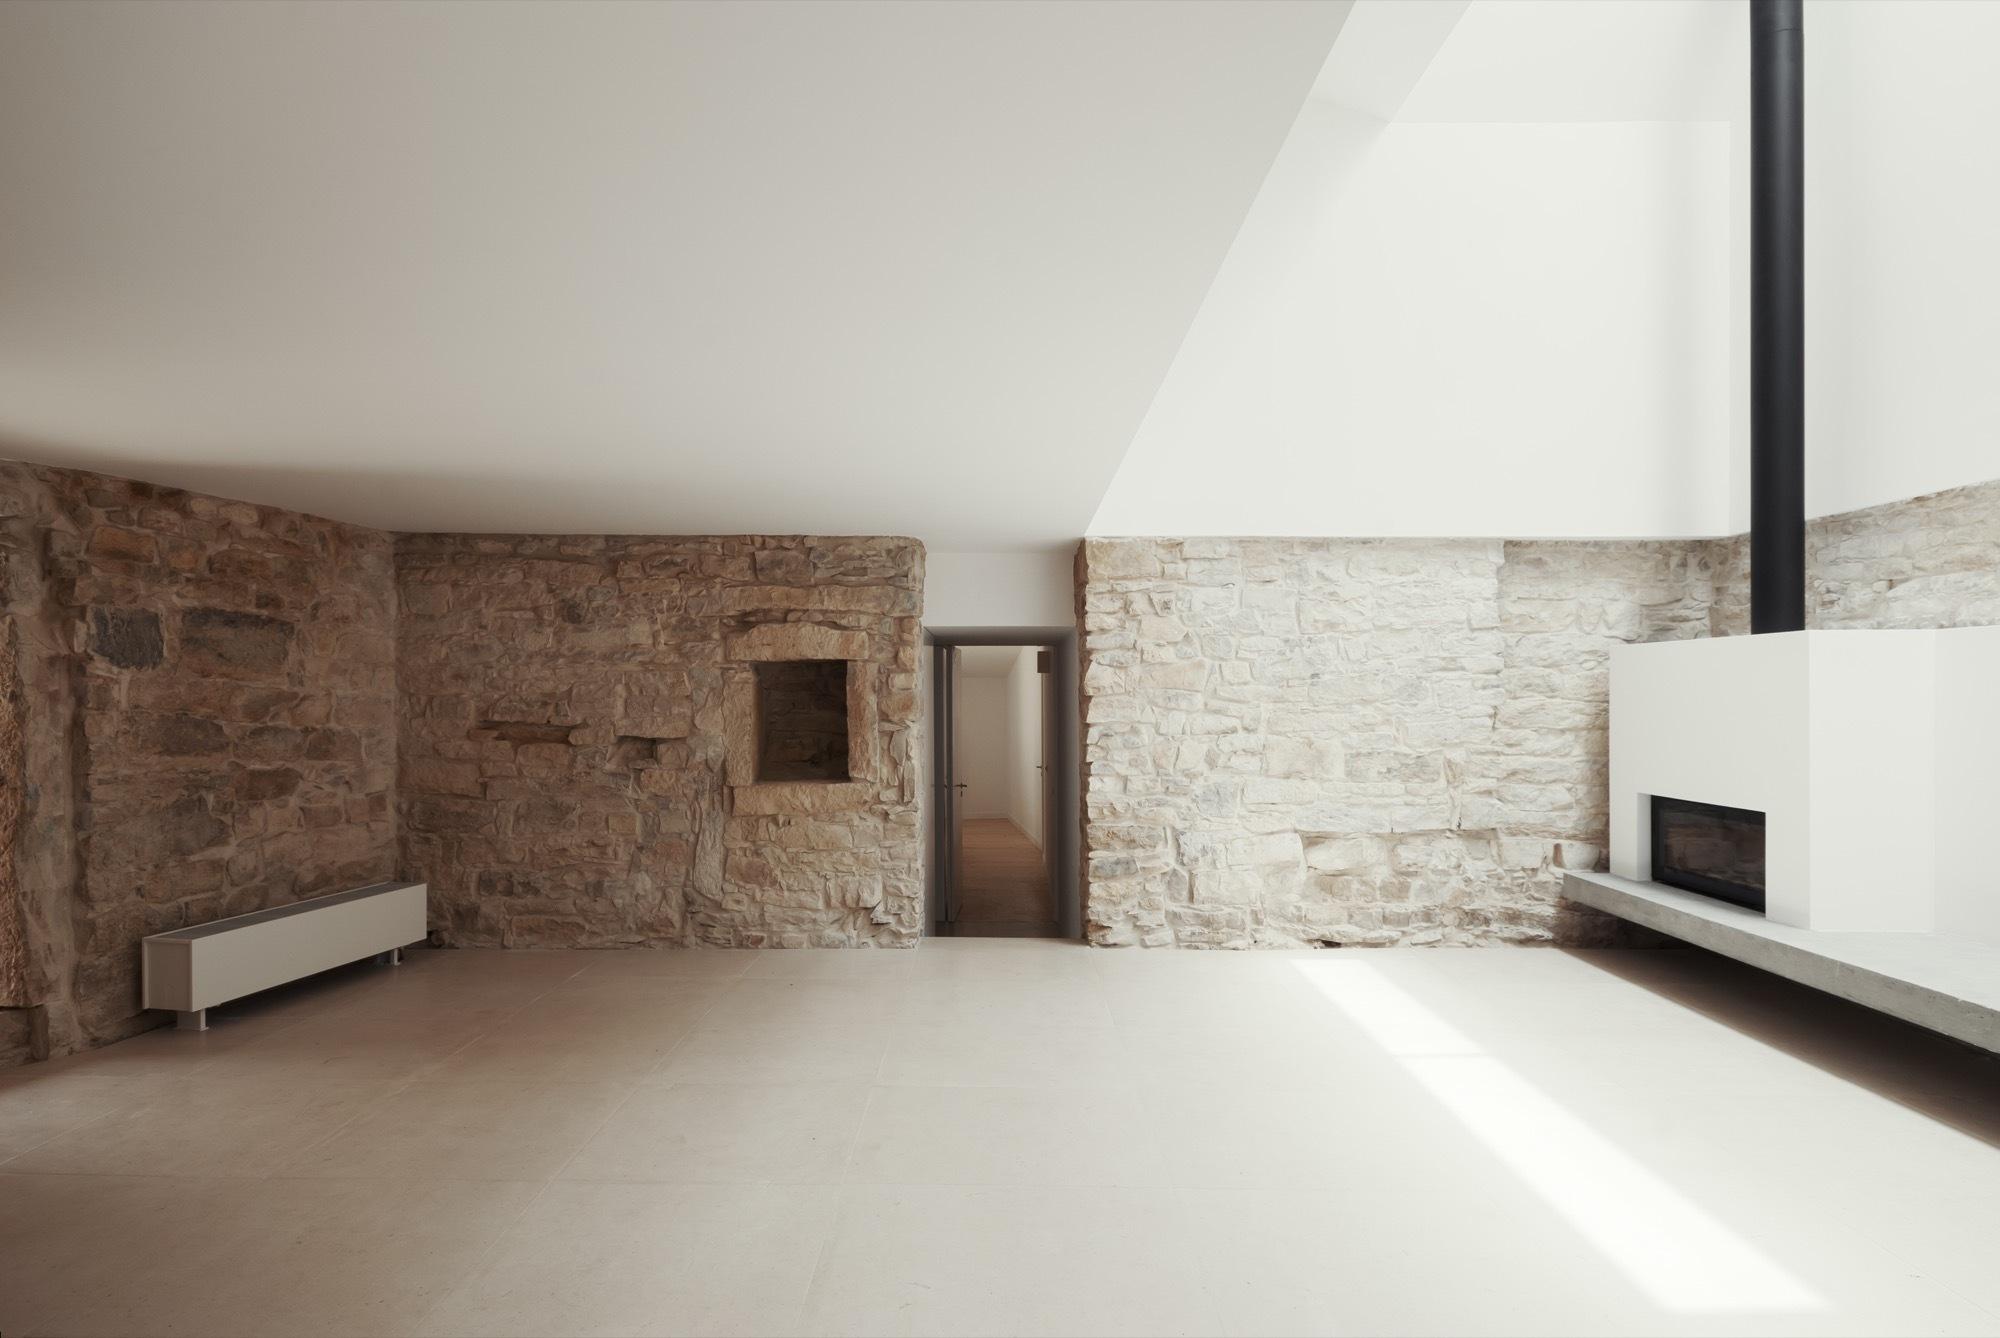 Gallery of house in janeanes branco delrio arquitectos 14 for Case in pietra e legno